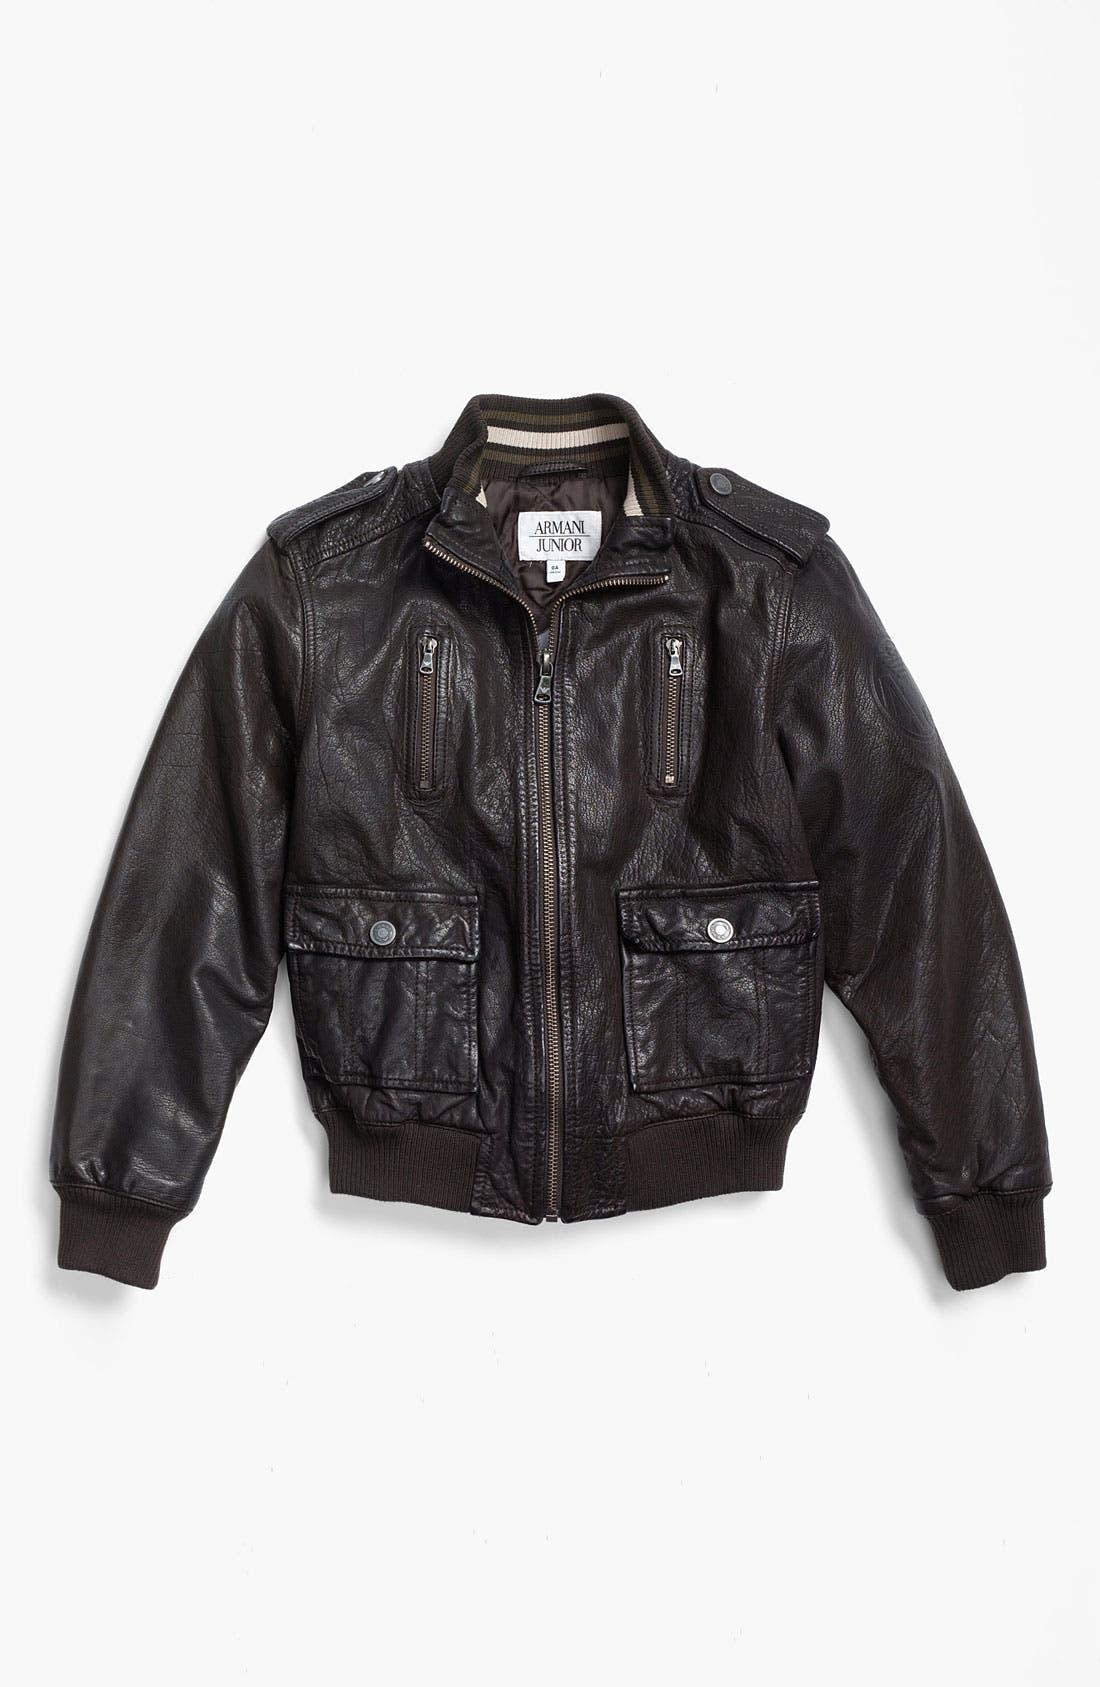 Alternate Image 1 Selected - Armani Junior Leather Jacket (Big Boys)